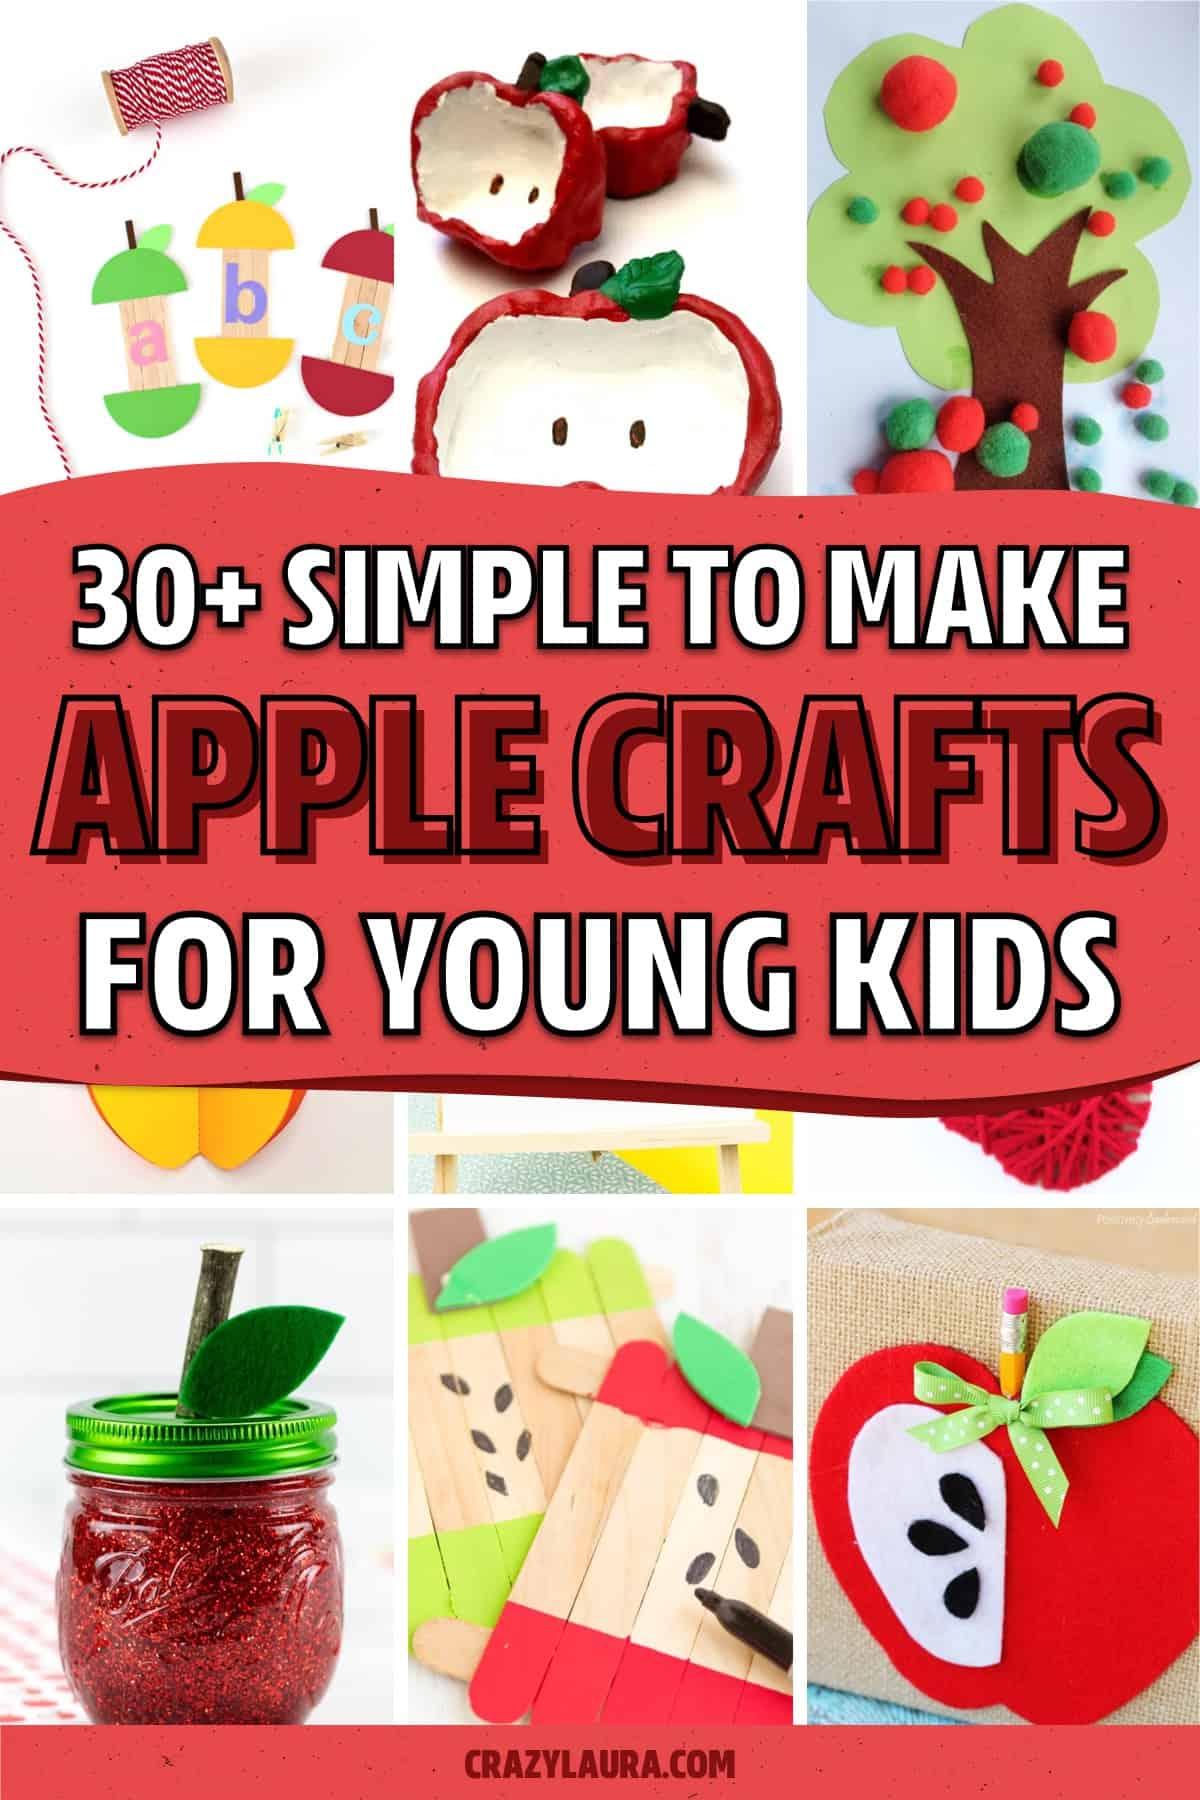 preschool craft tutorials with apple shapes